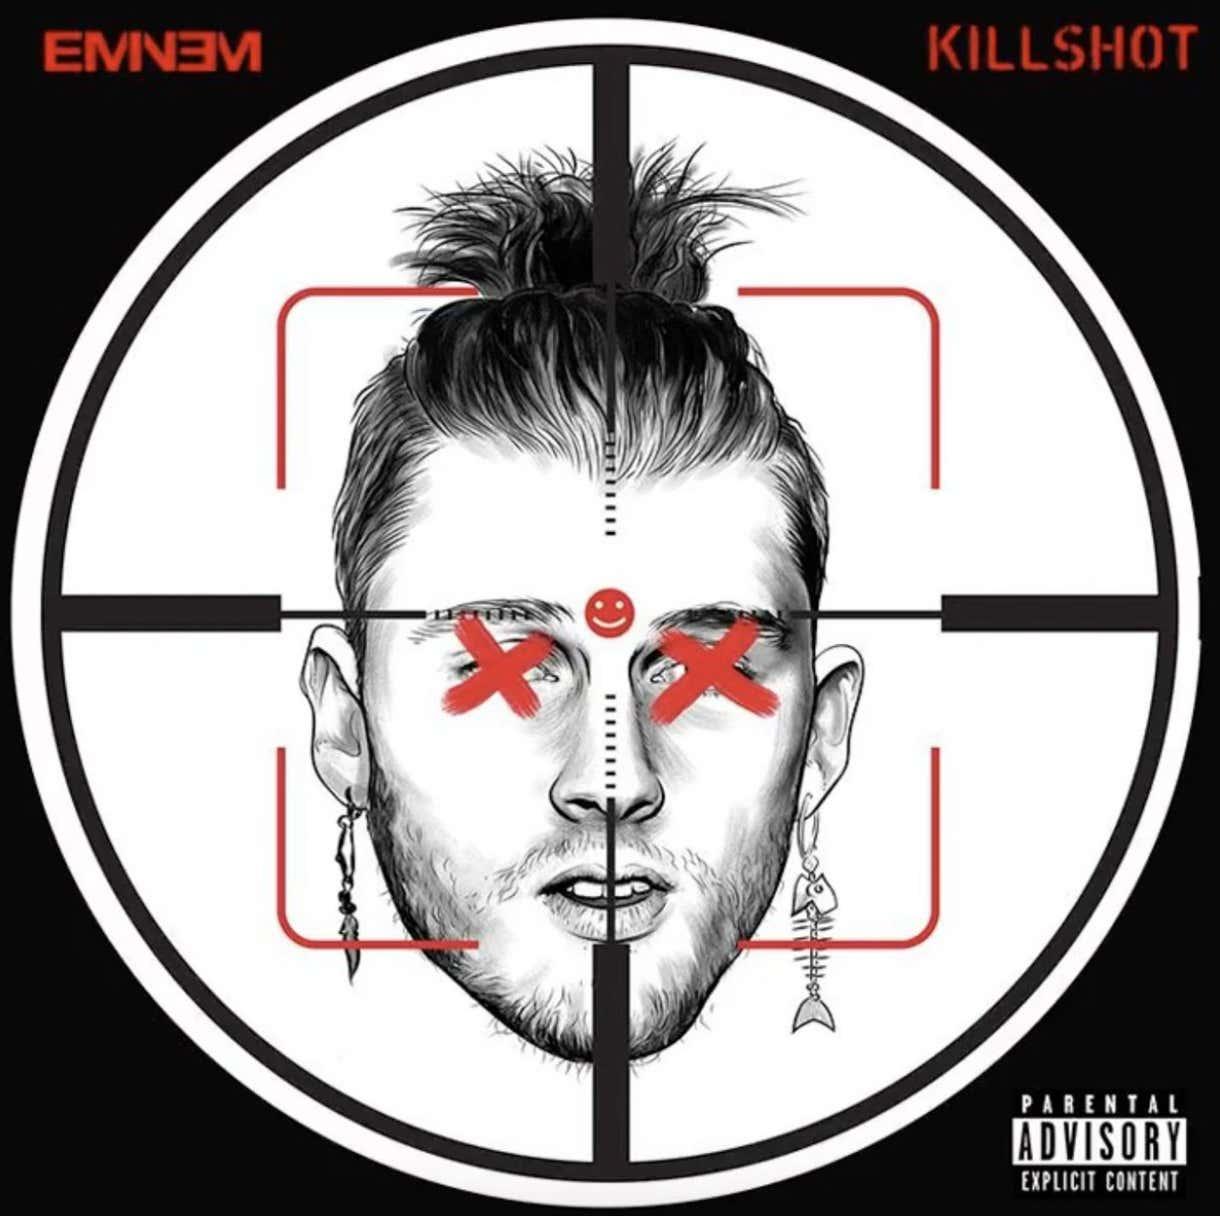 Eminem Responds To Machine Gun Kelly With Killshot Diss Barstool